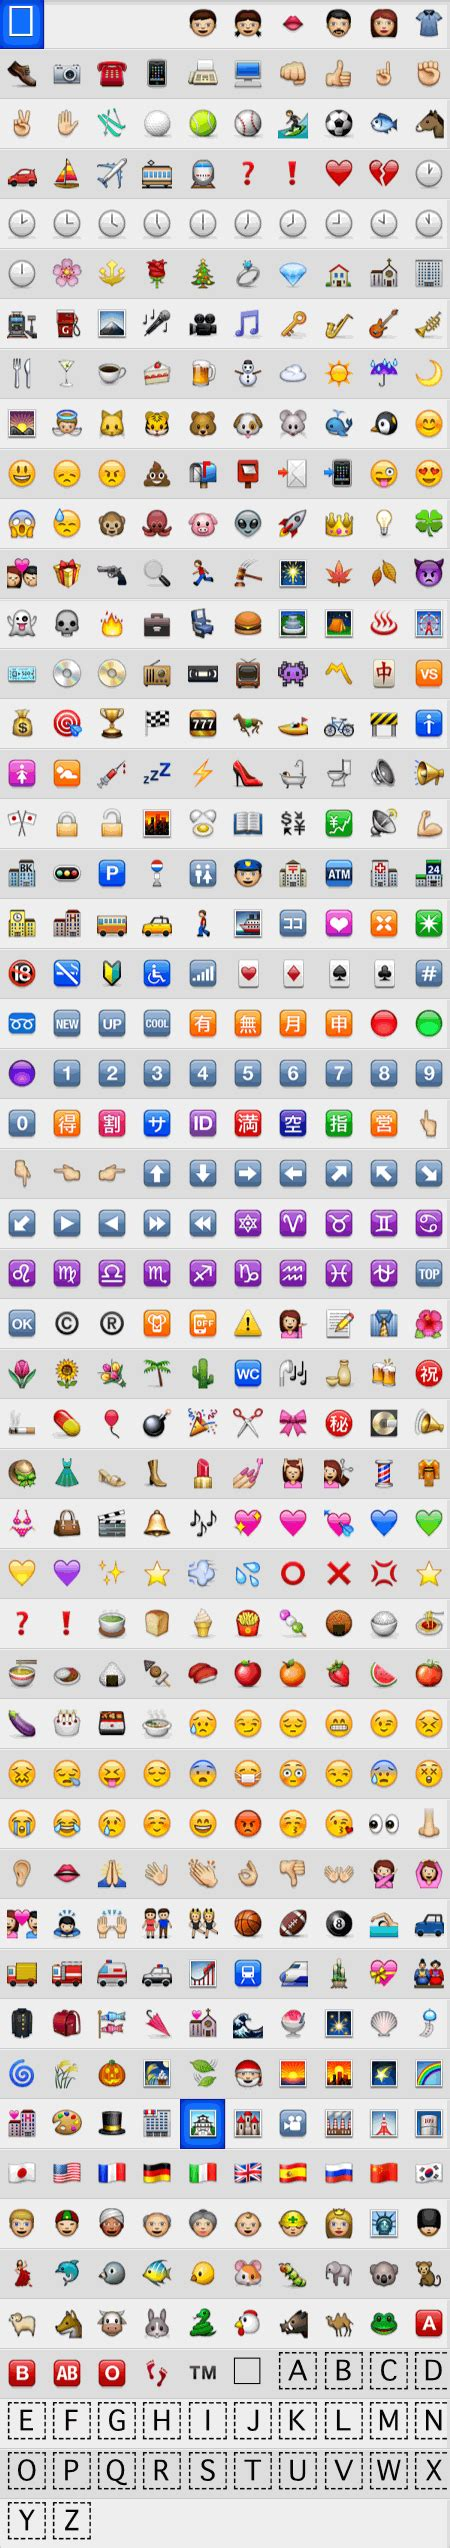 emoji font the apple color emoji font 30 typefaces their look